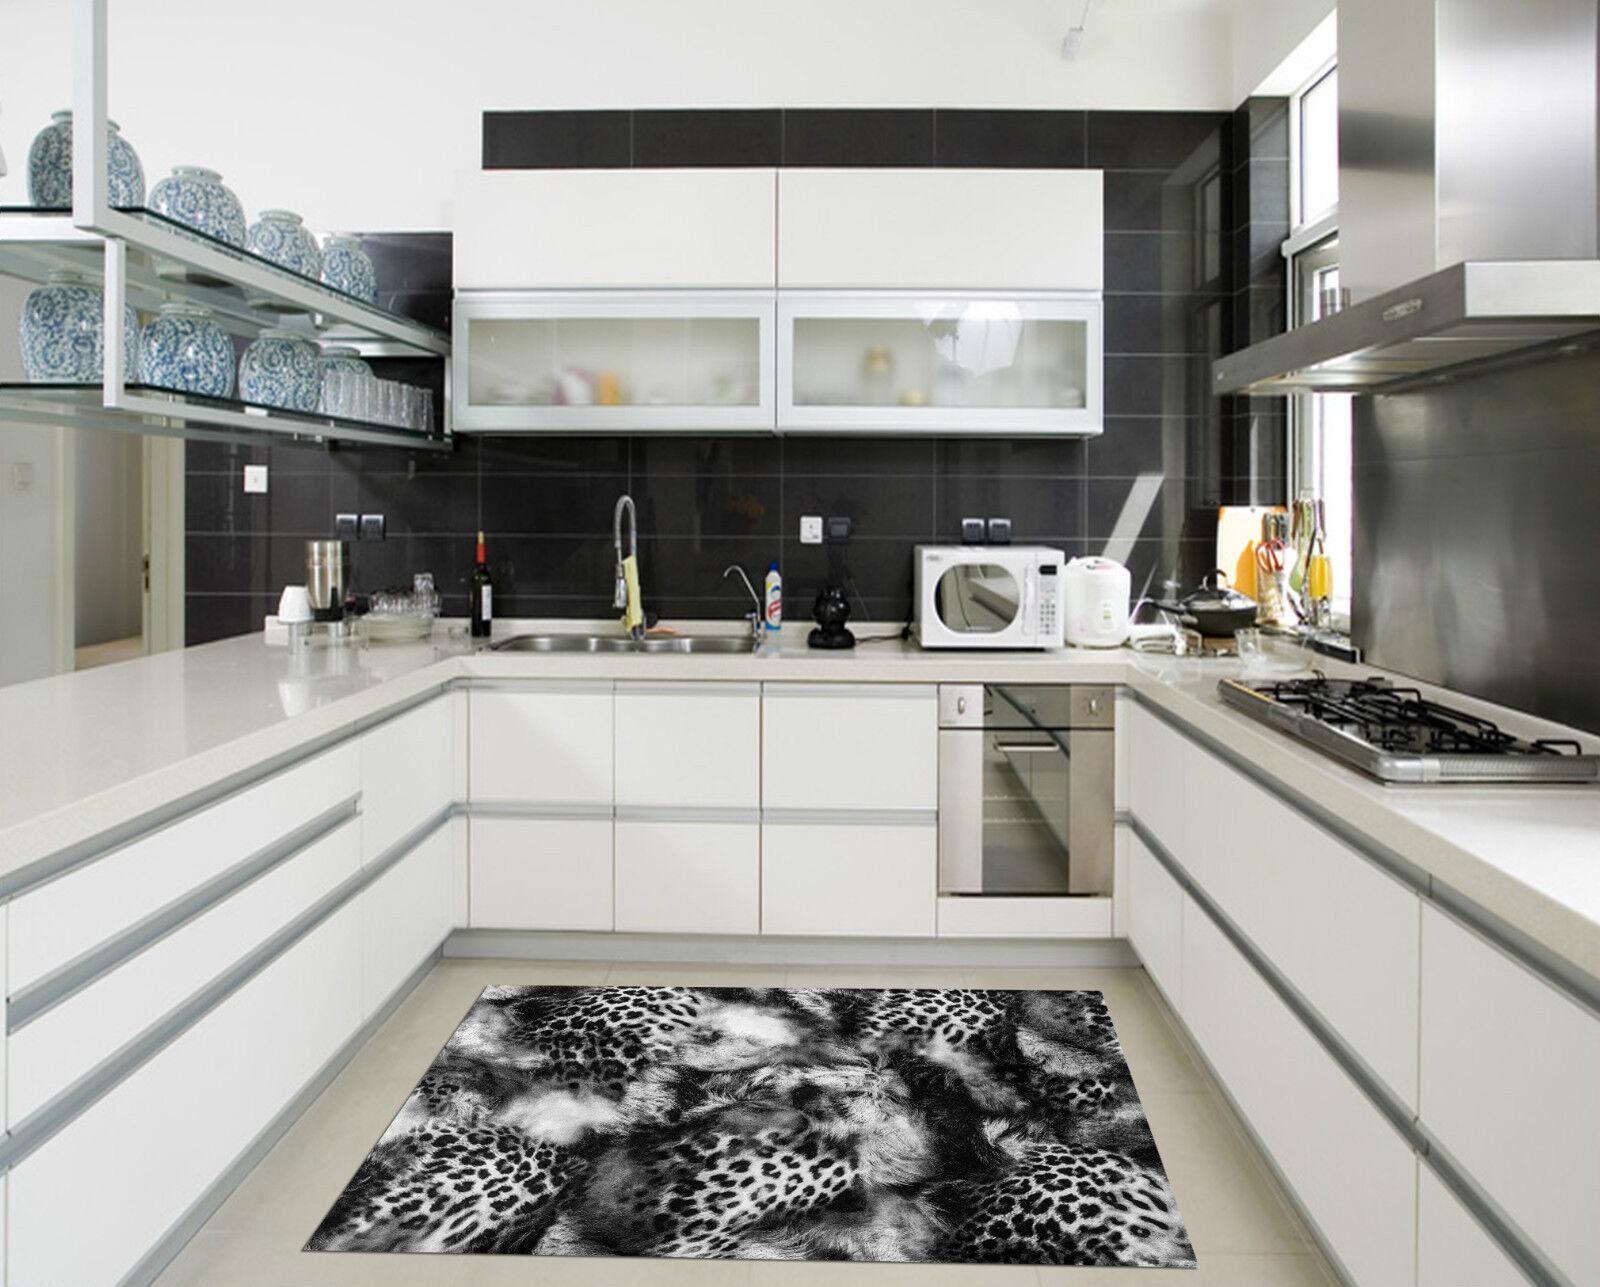 3D 3D 3D Leopard Feather Kitchen Mat Floor Mural Wall Print Wall Deco AJ WALLPAPER CA 0dafbe